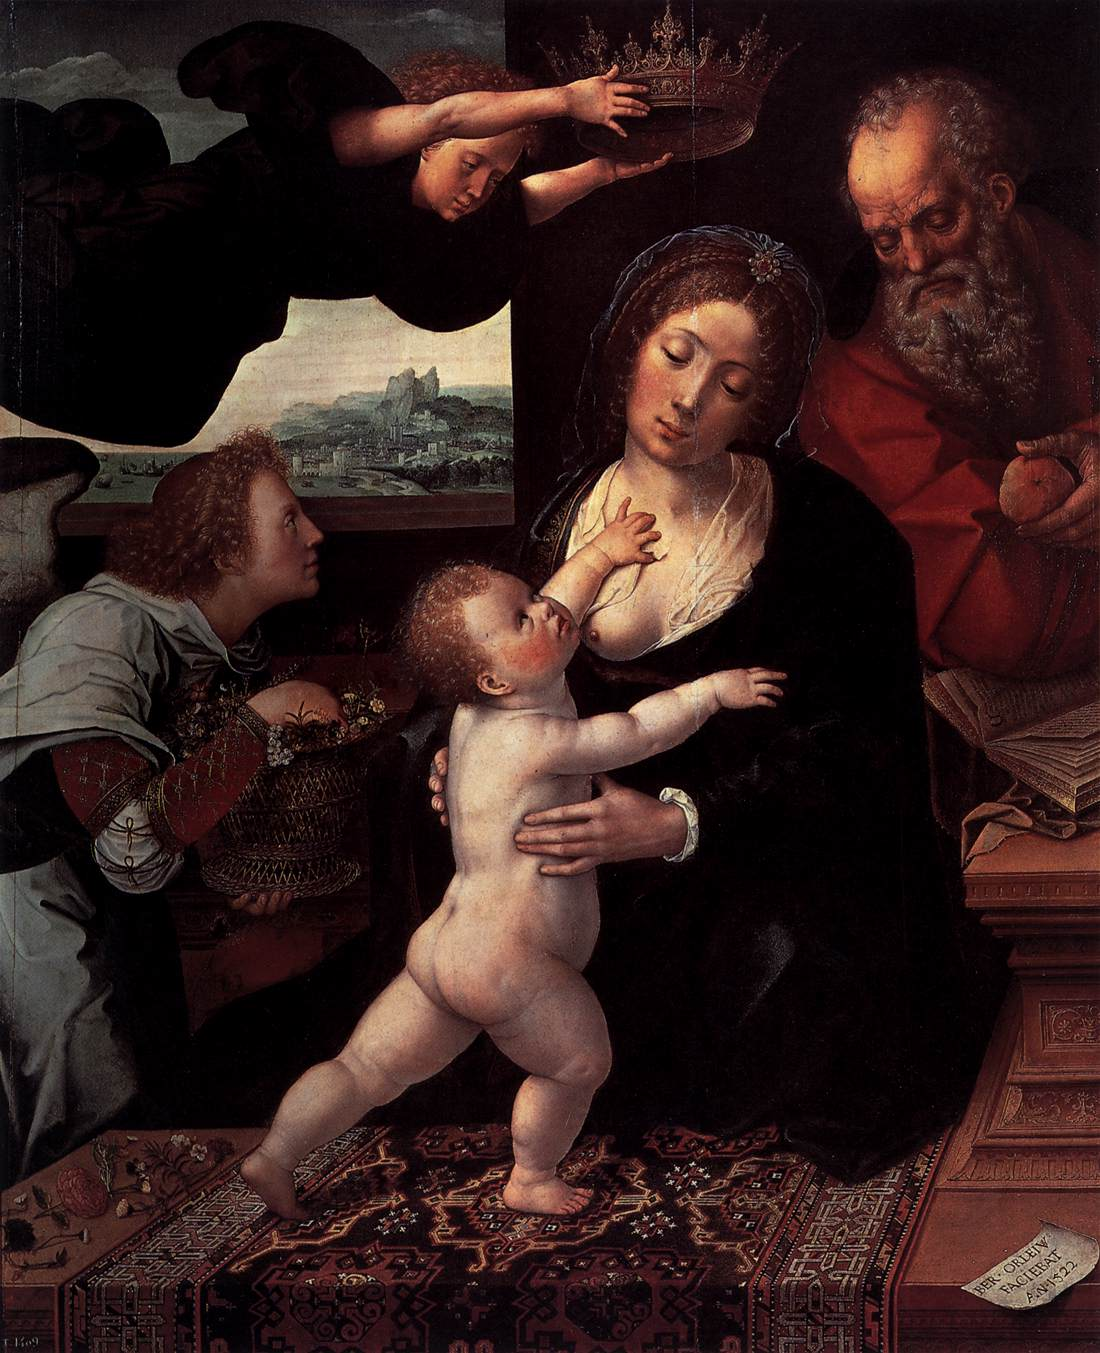 https://i2.wp.com/upload.wikimedia.org/wikipedia/commons/a/ad/Bernard_van_Orley_-_Holy_Family_-_WGA16687.jpg